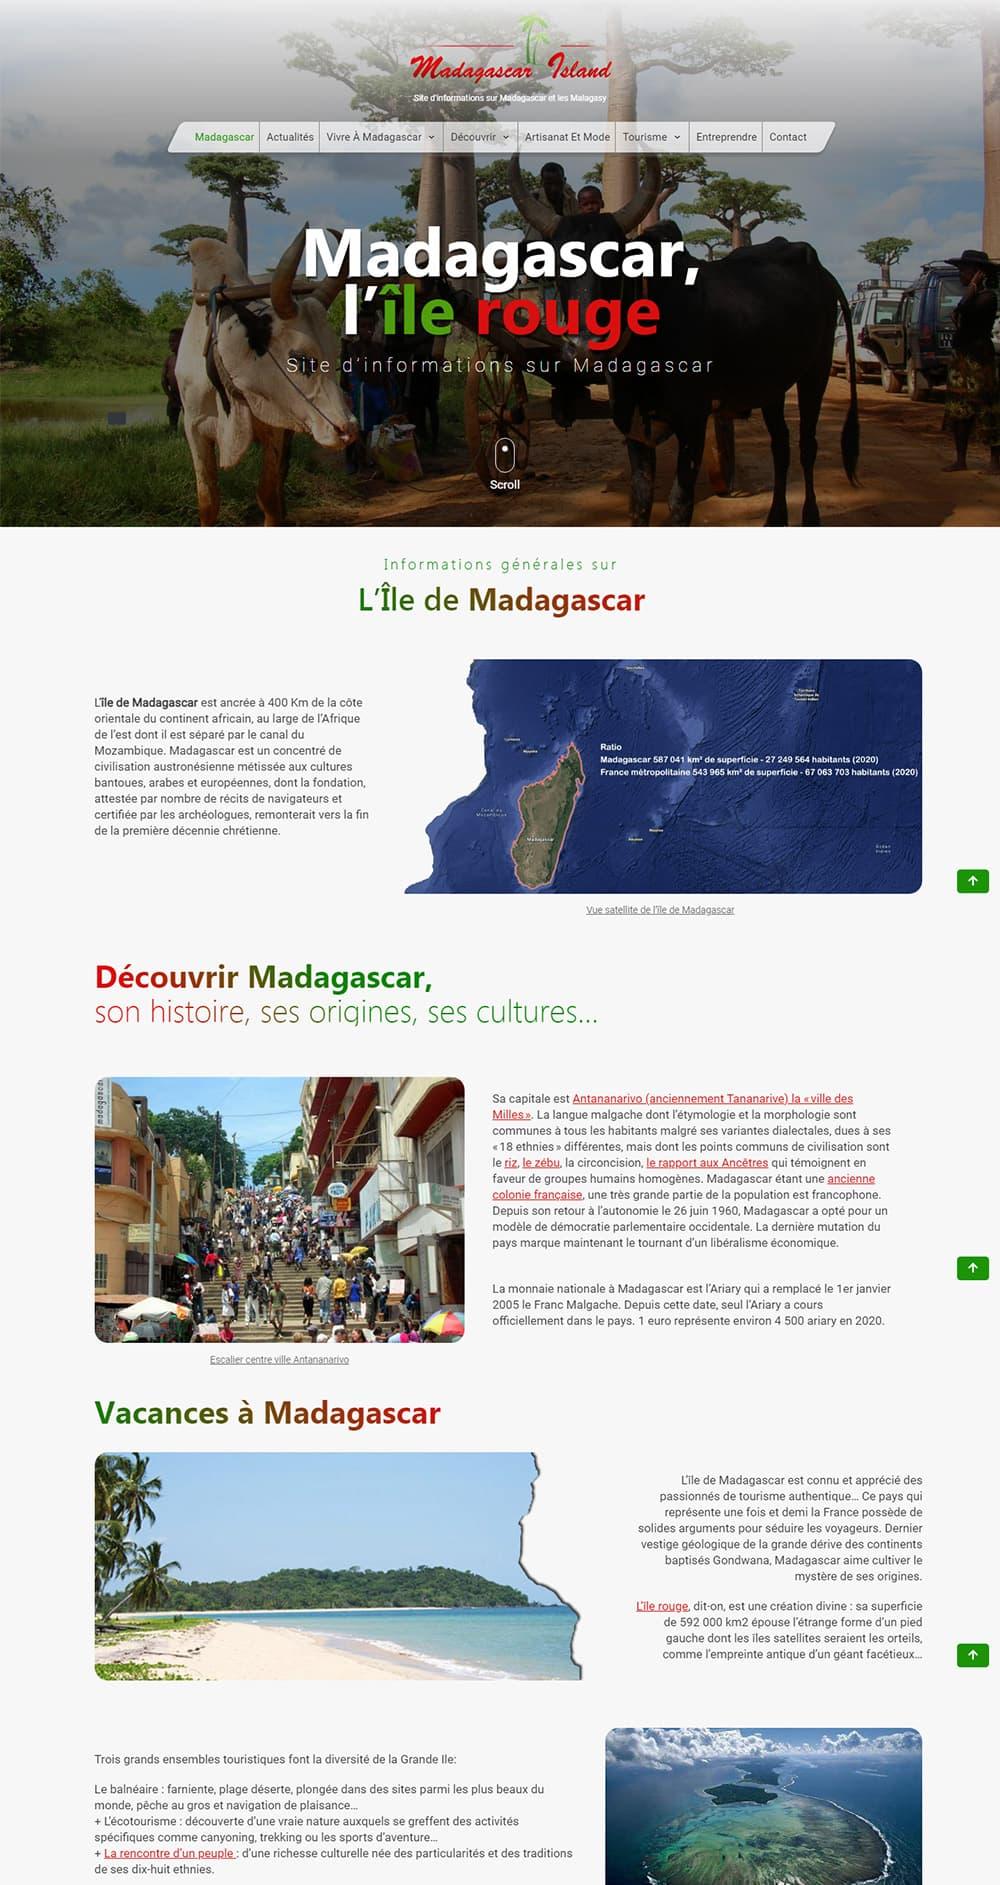 madagascar_island-min